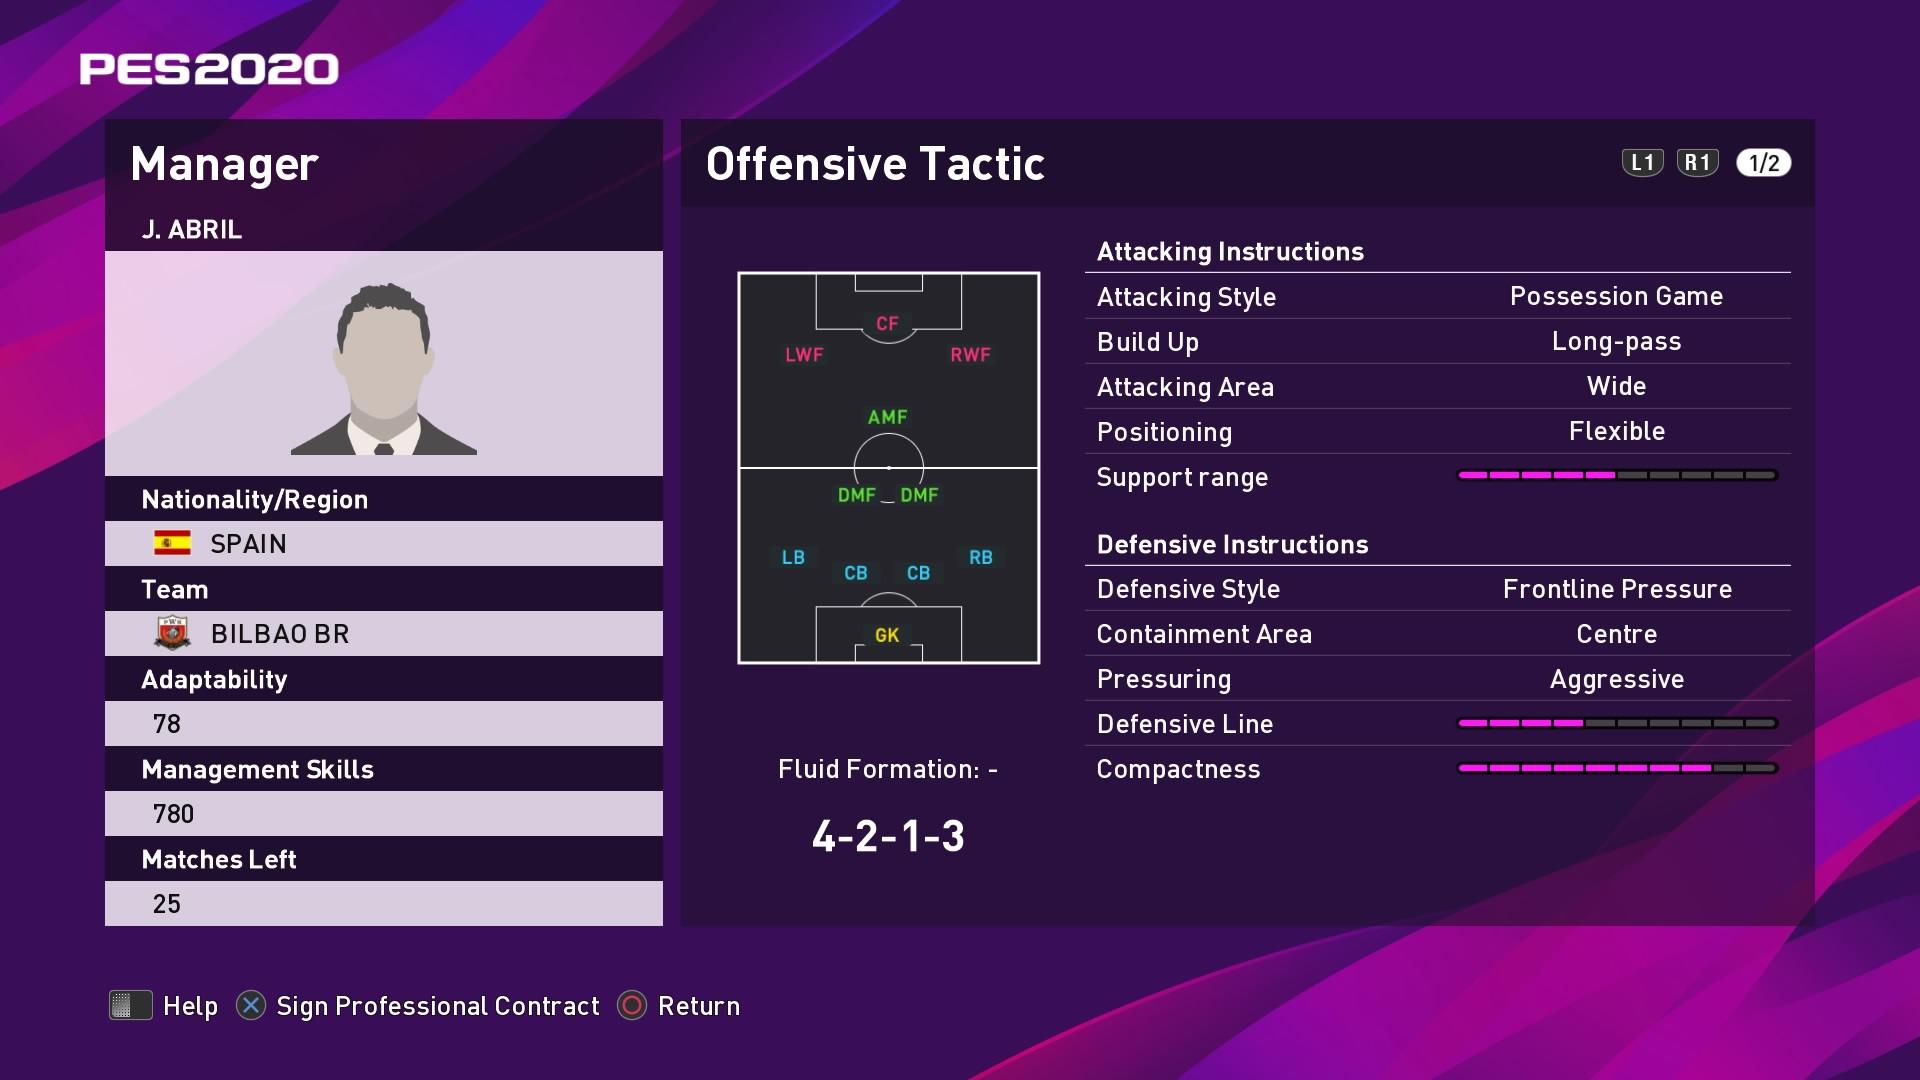 J. Abril (2) (Gaizka Garitano) Offensive Tactic in PES 2020 myClub